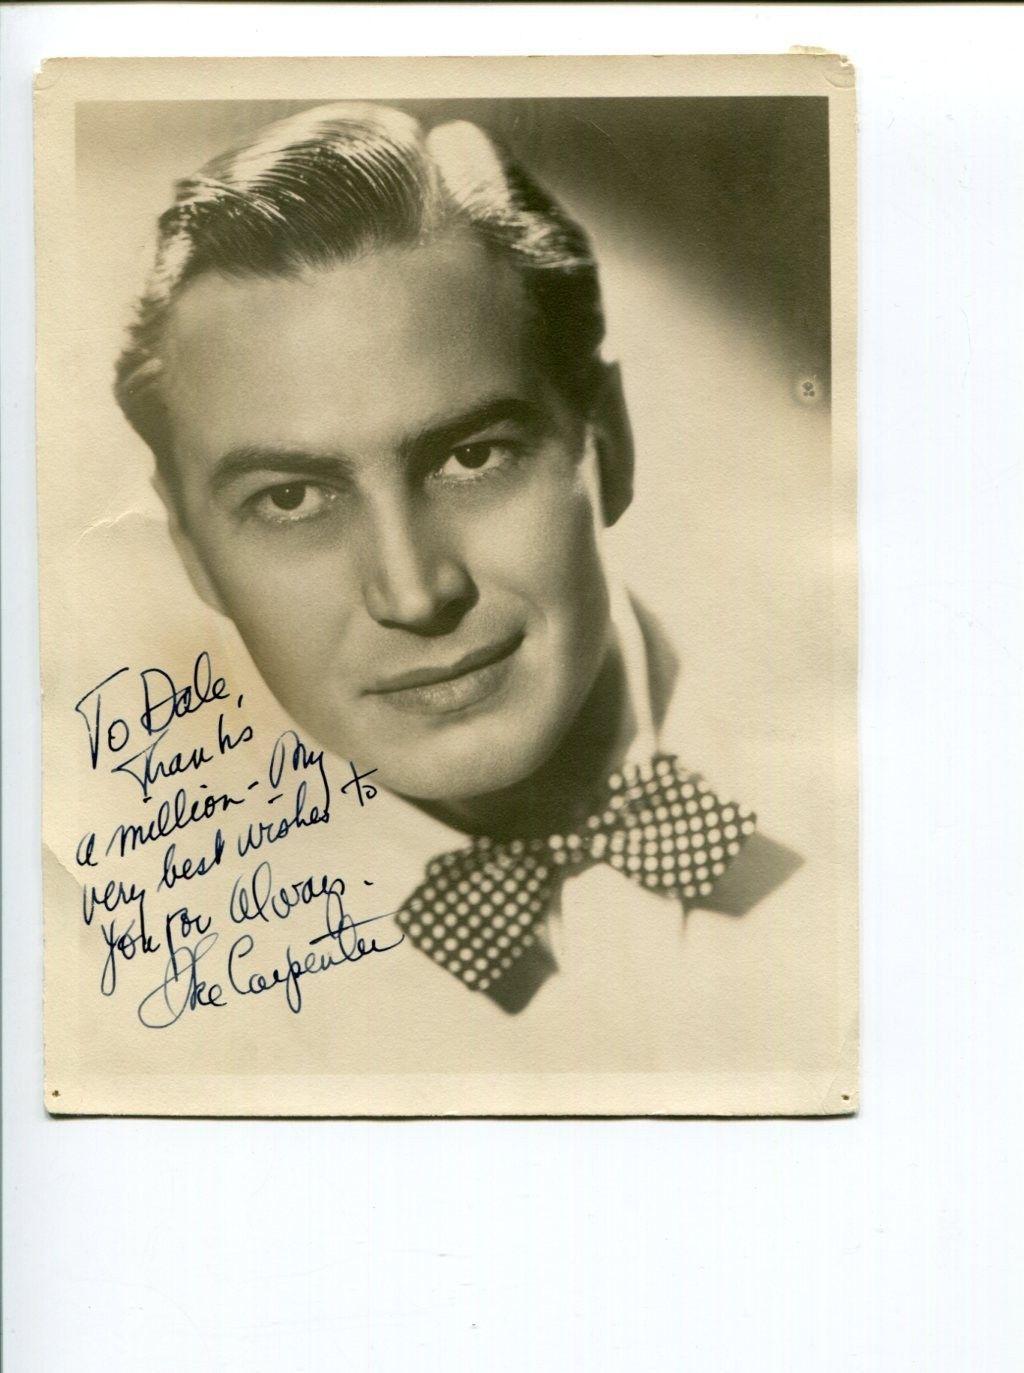 Isaac Ike Carpenter Jazz Big Band Pianist Bandleader Signed Autograph Photo